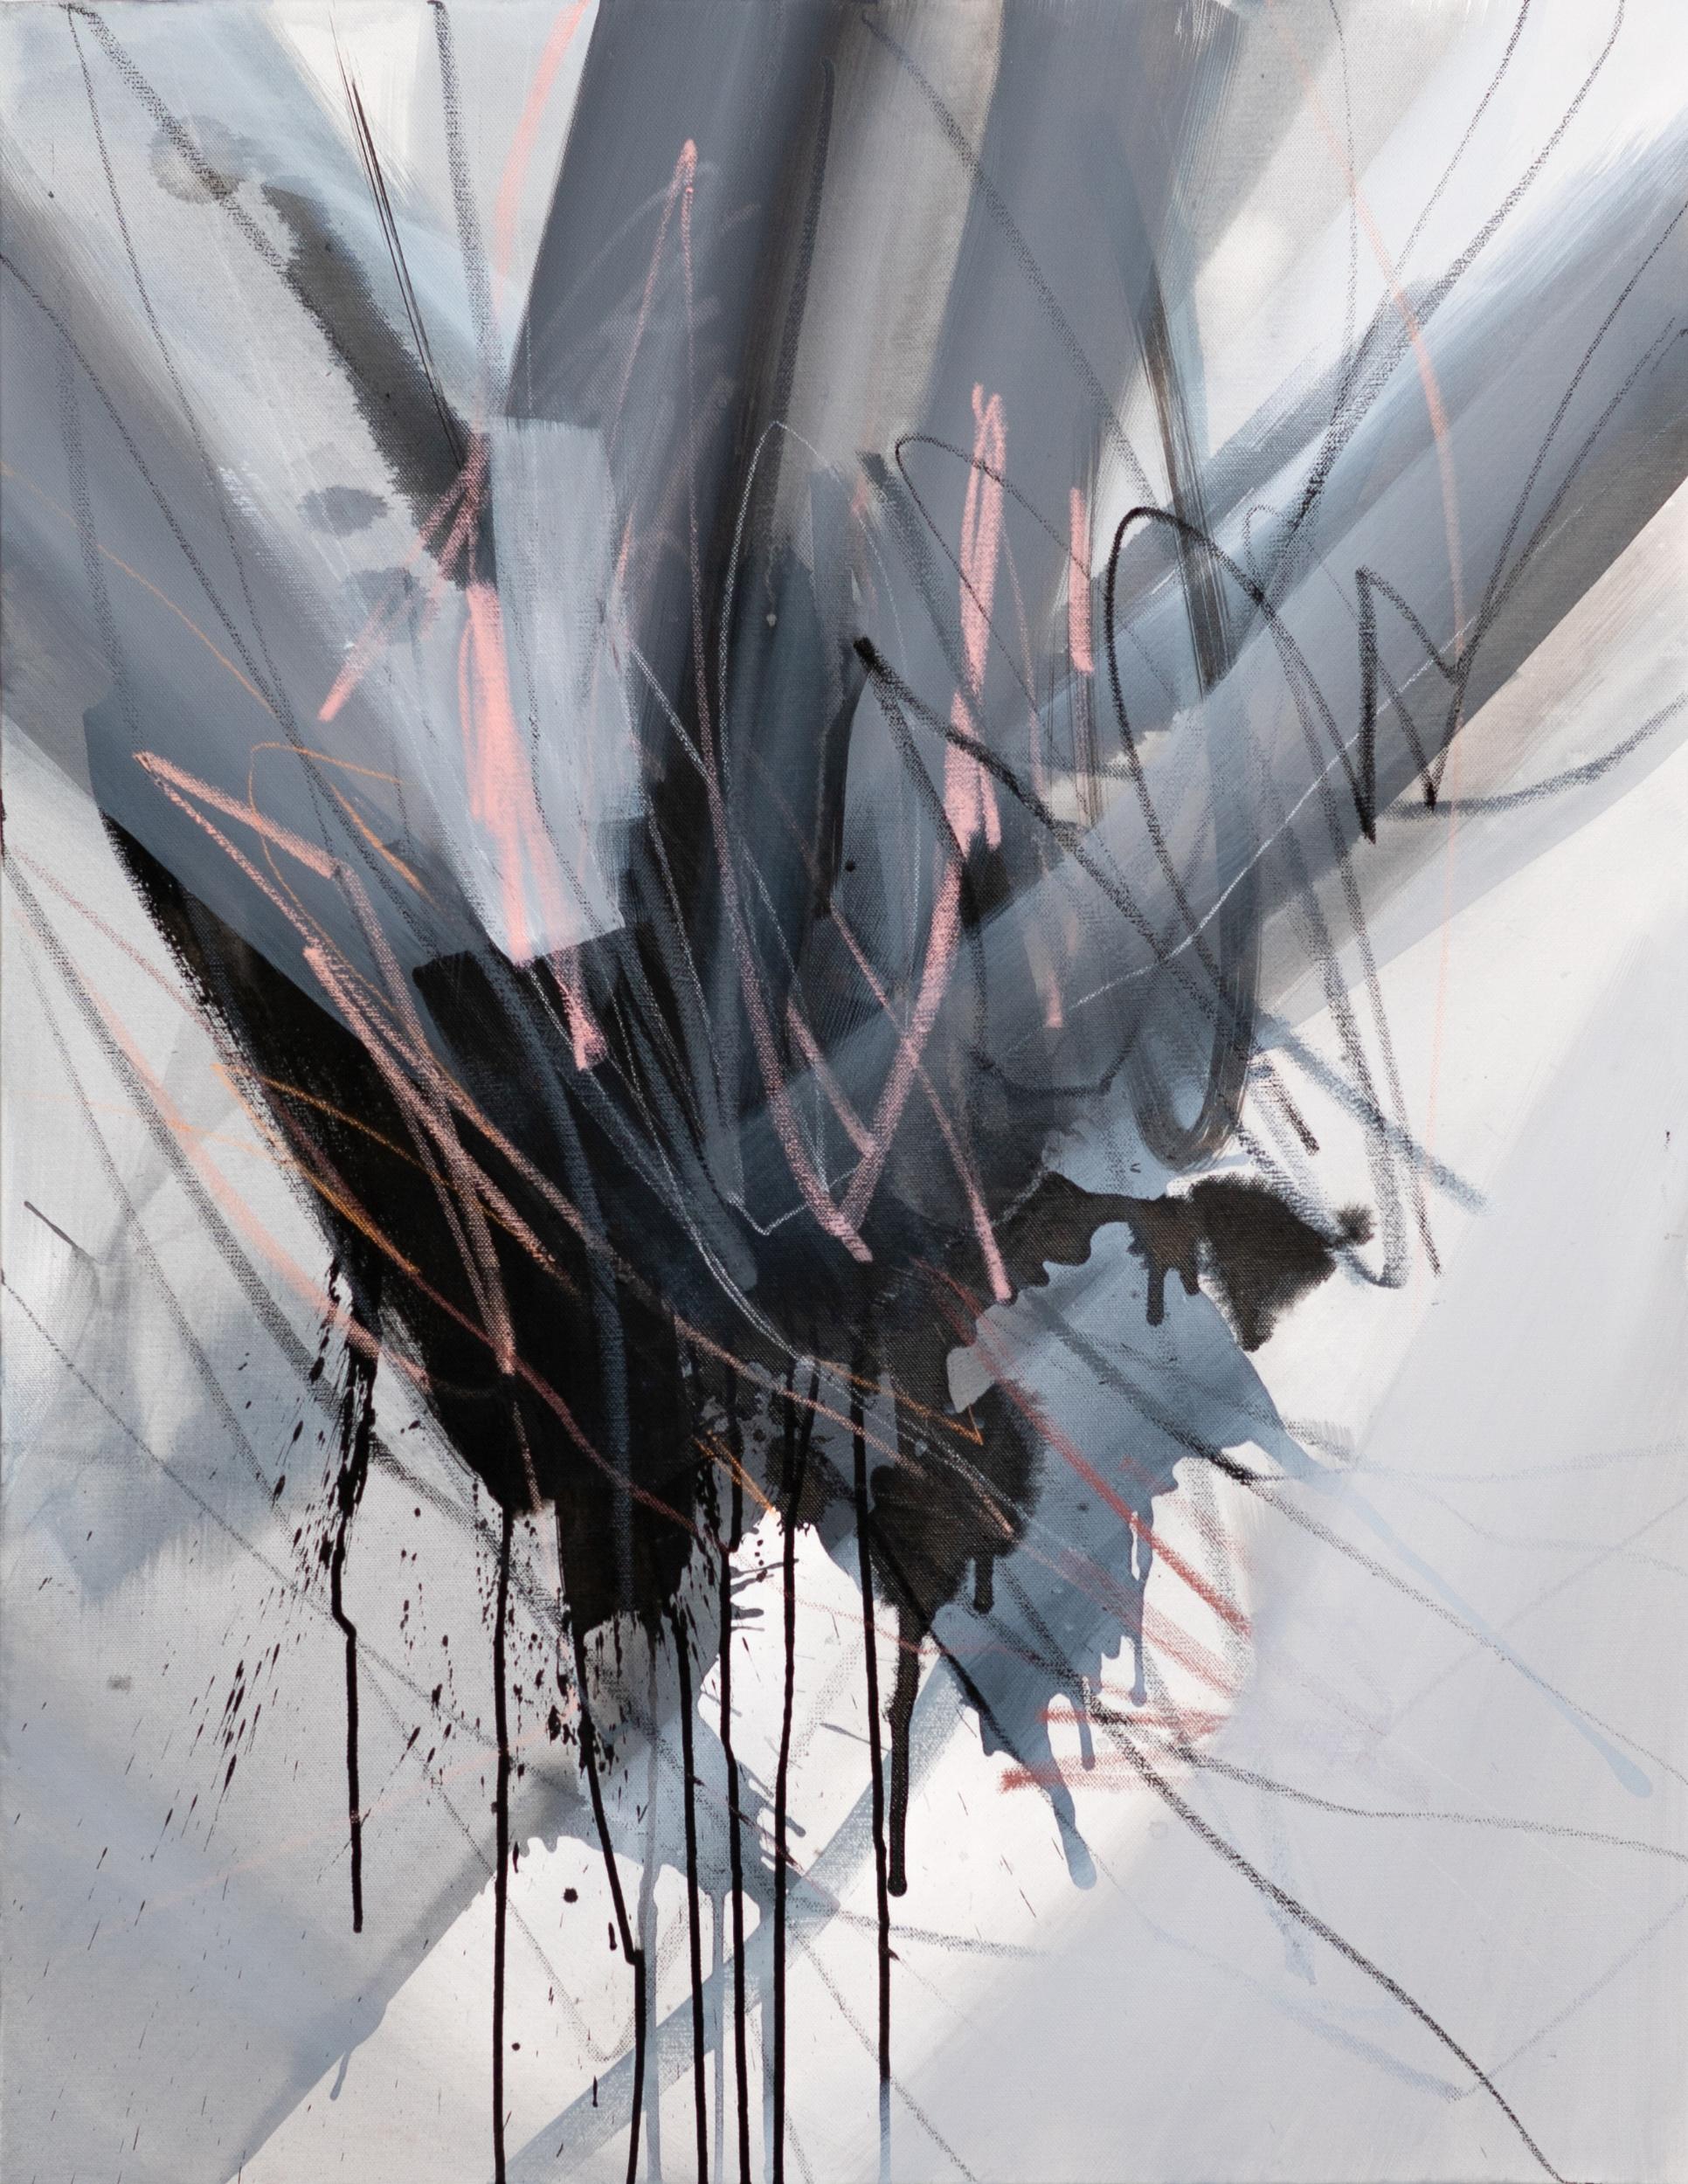 2018_Paintings_RebeccaRuetten_Rehe_3_1-2.jpg